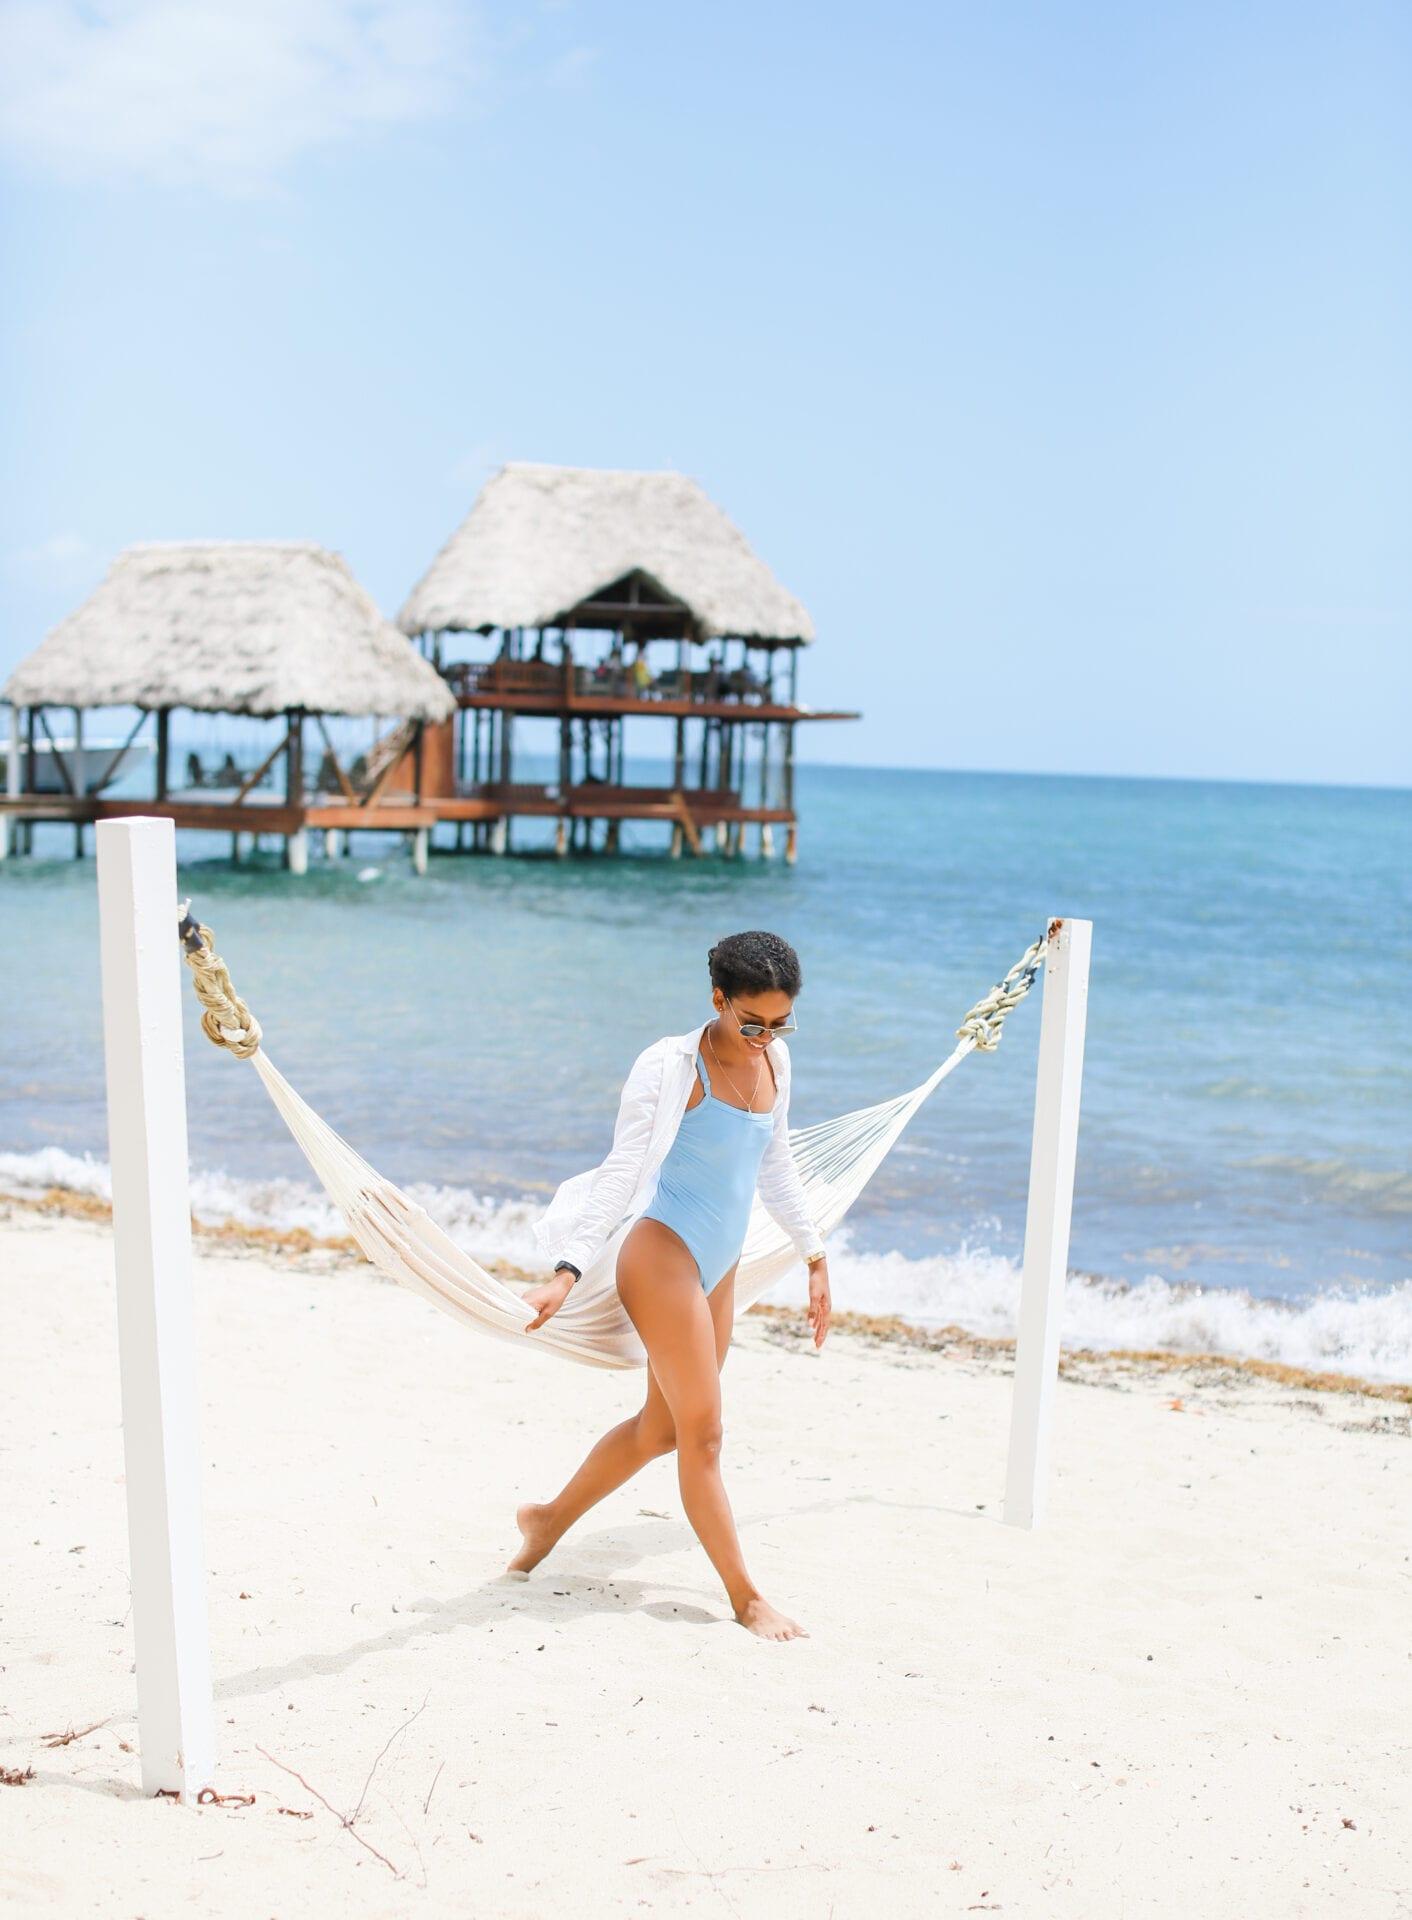 jaguar-reef-lodge-monica-gallardo-photography-hopkins-beach